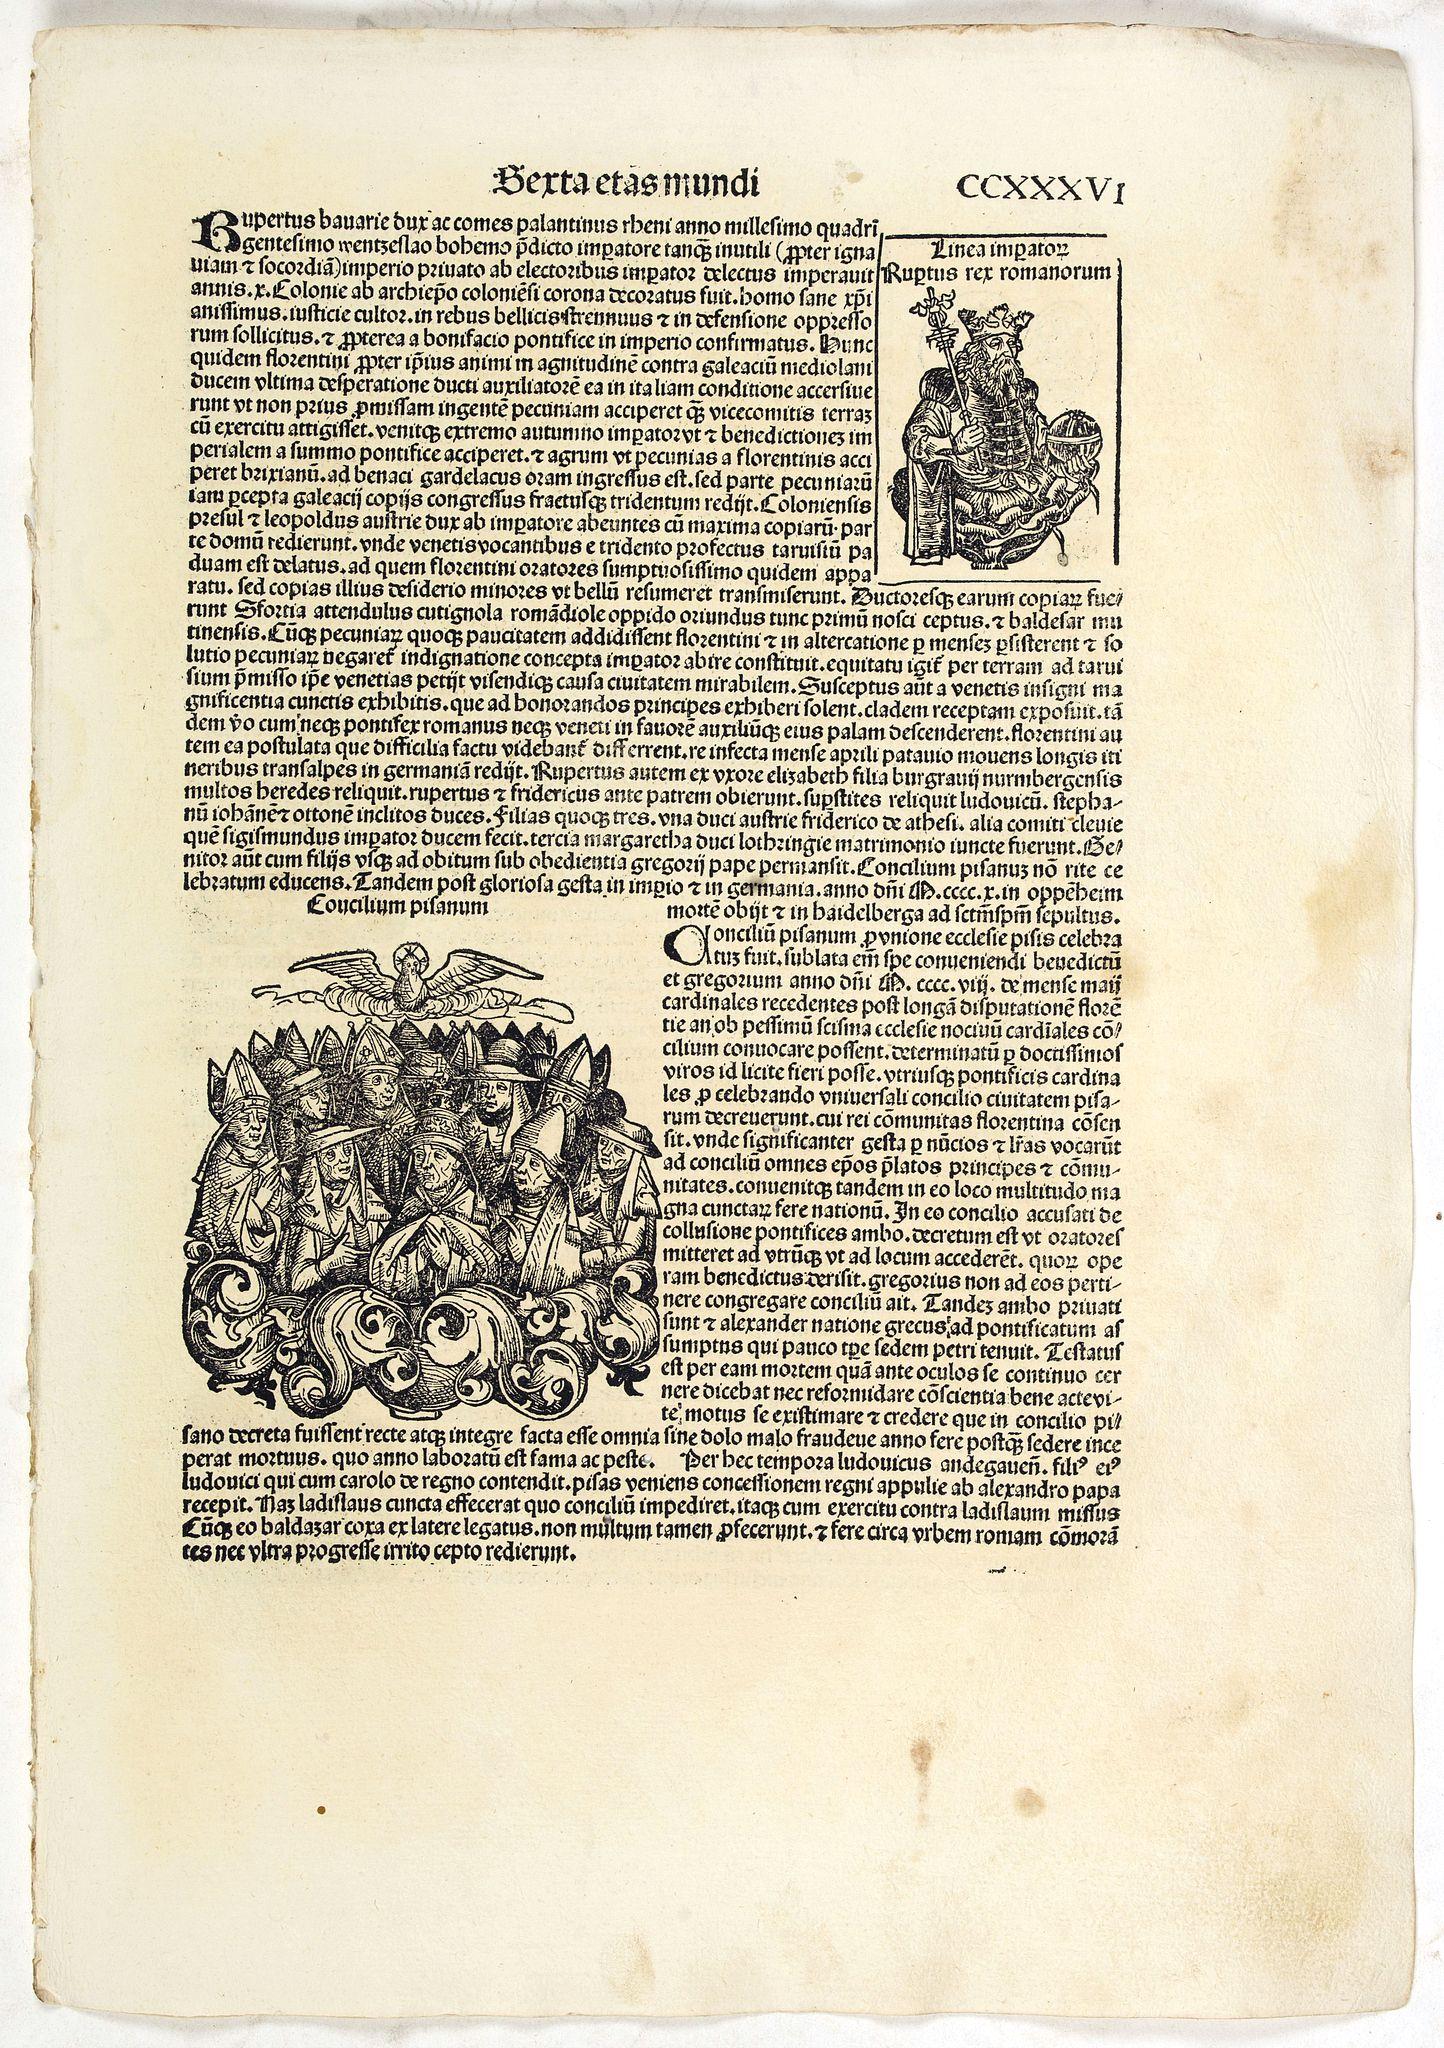 SCHEDEL, H. -  Terta Etas Mundi. Folium. CCXXXVI